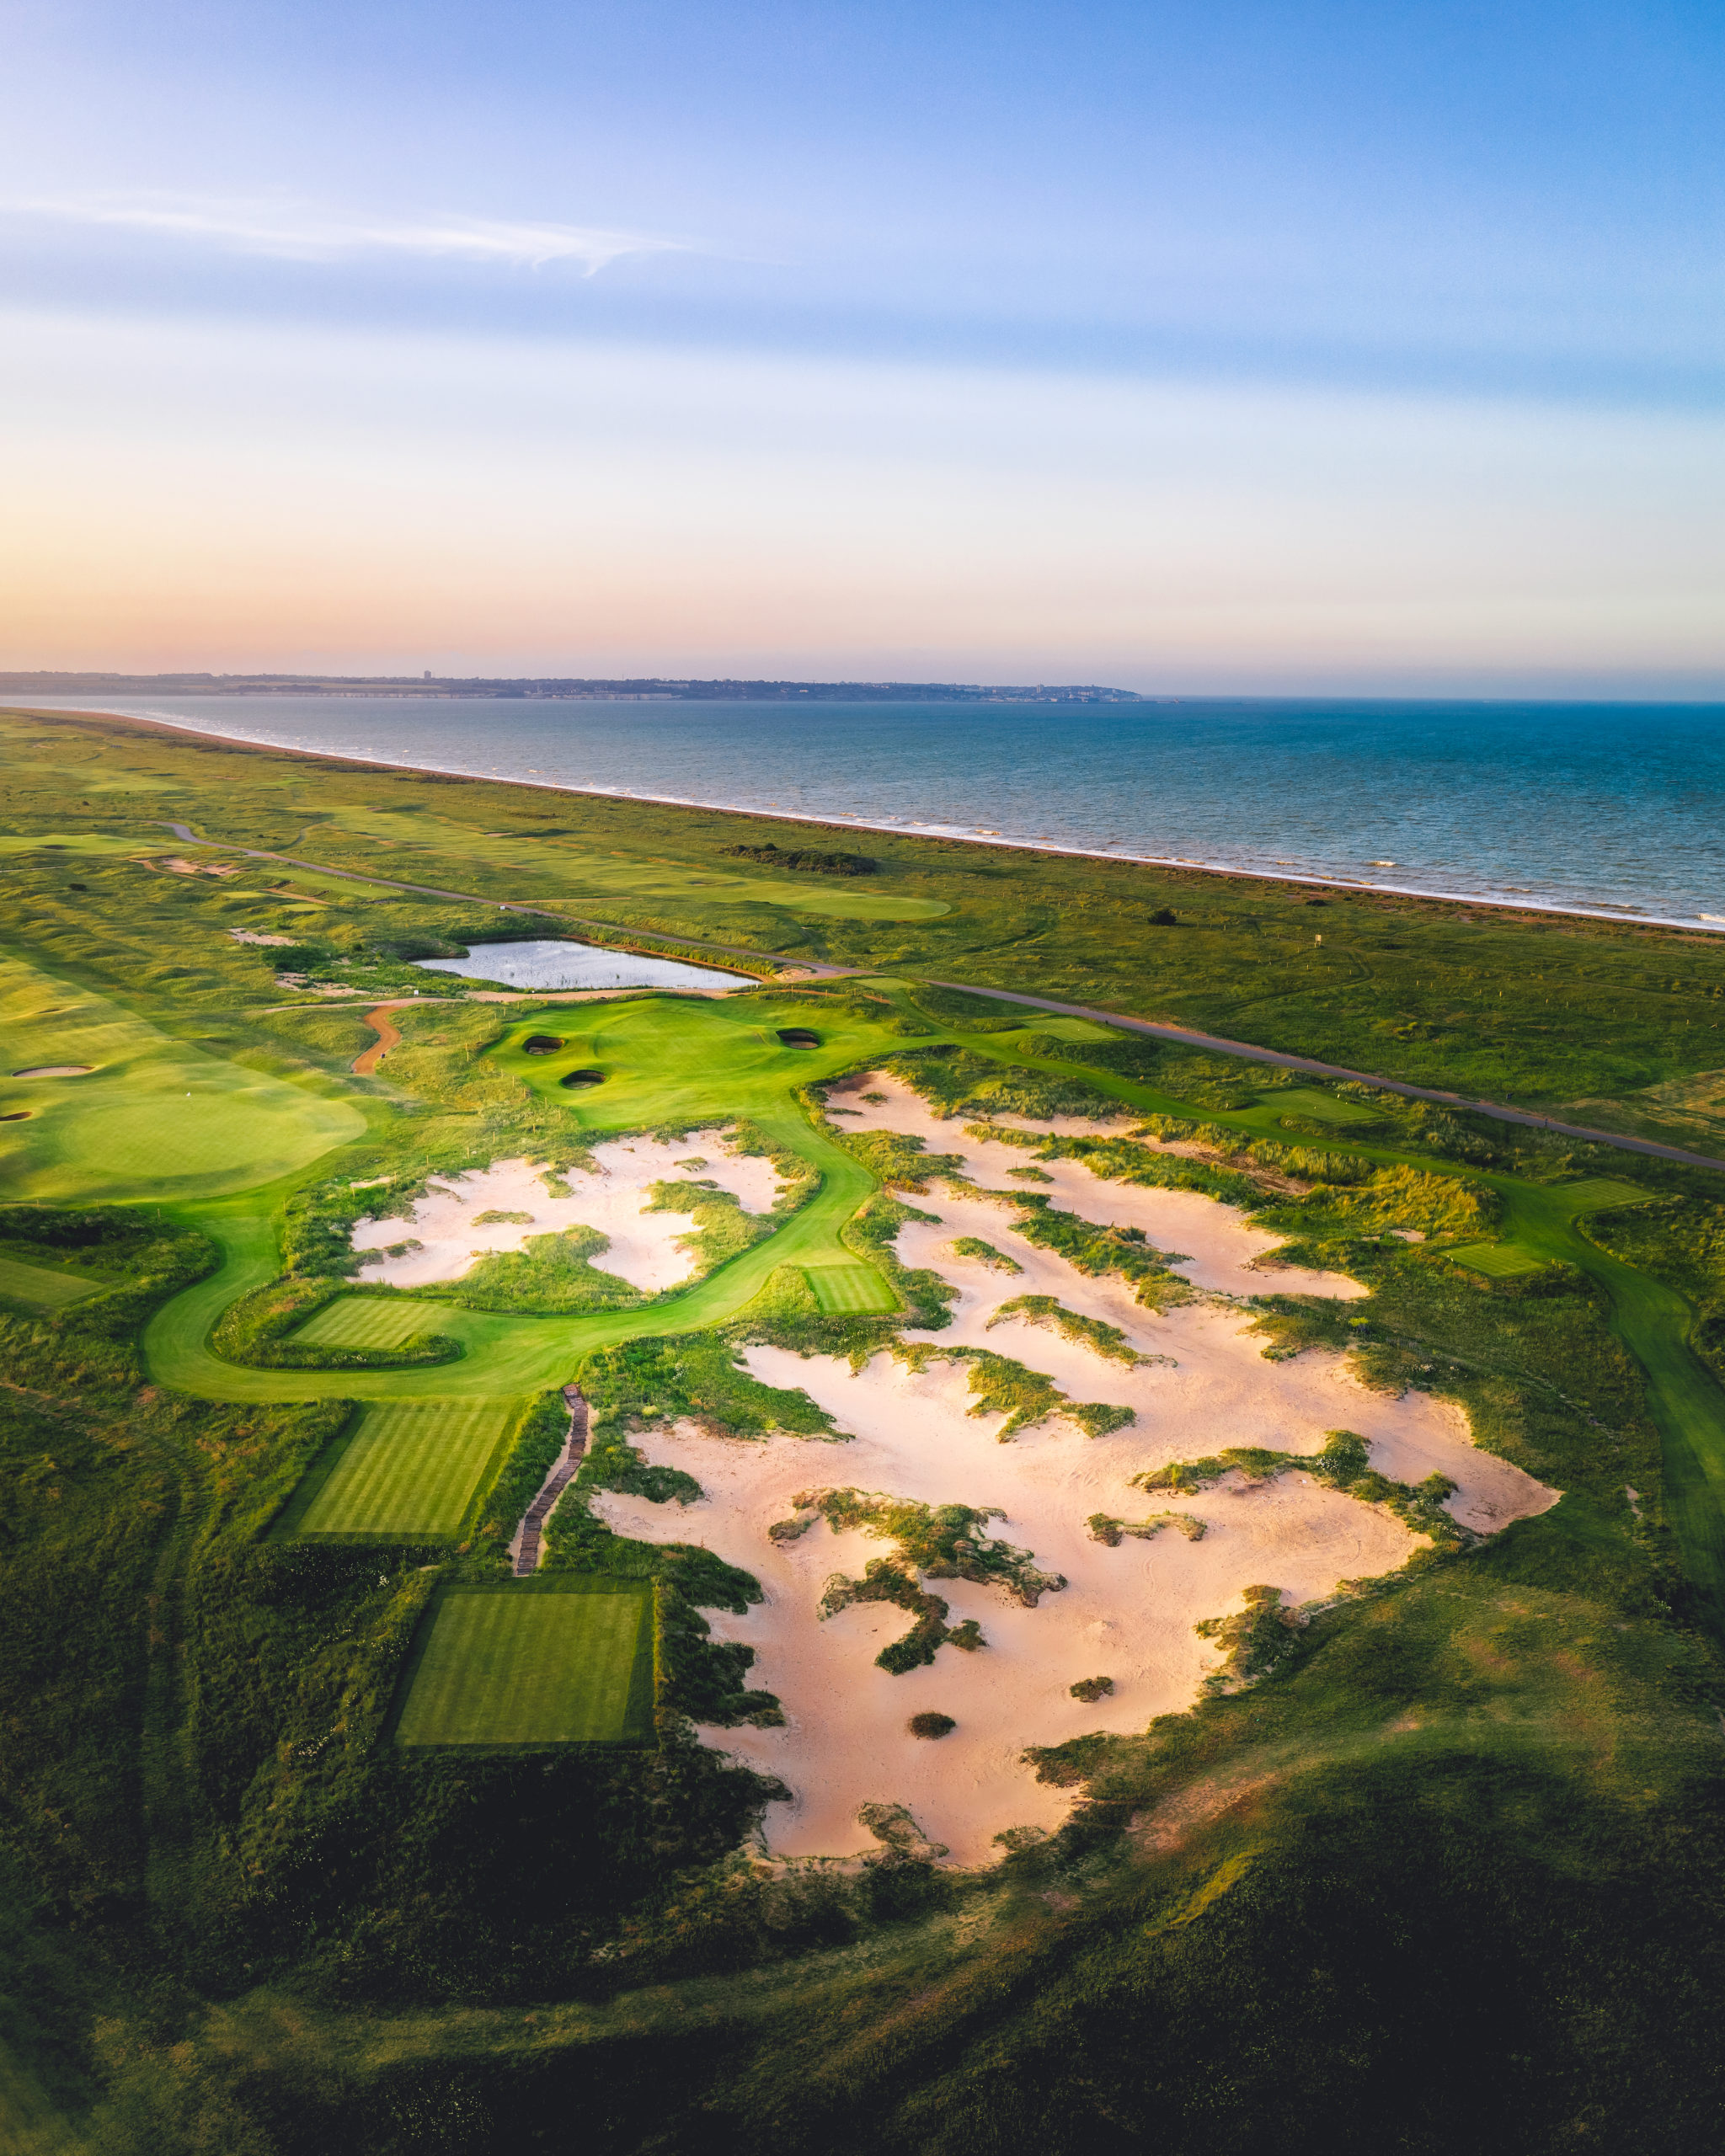 Shore-05th-New-Hole-Princes-Golf-Club-1105-99-Edit